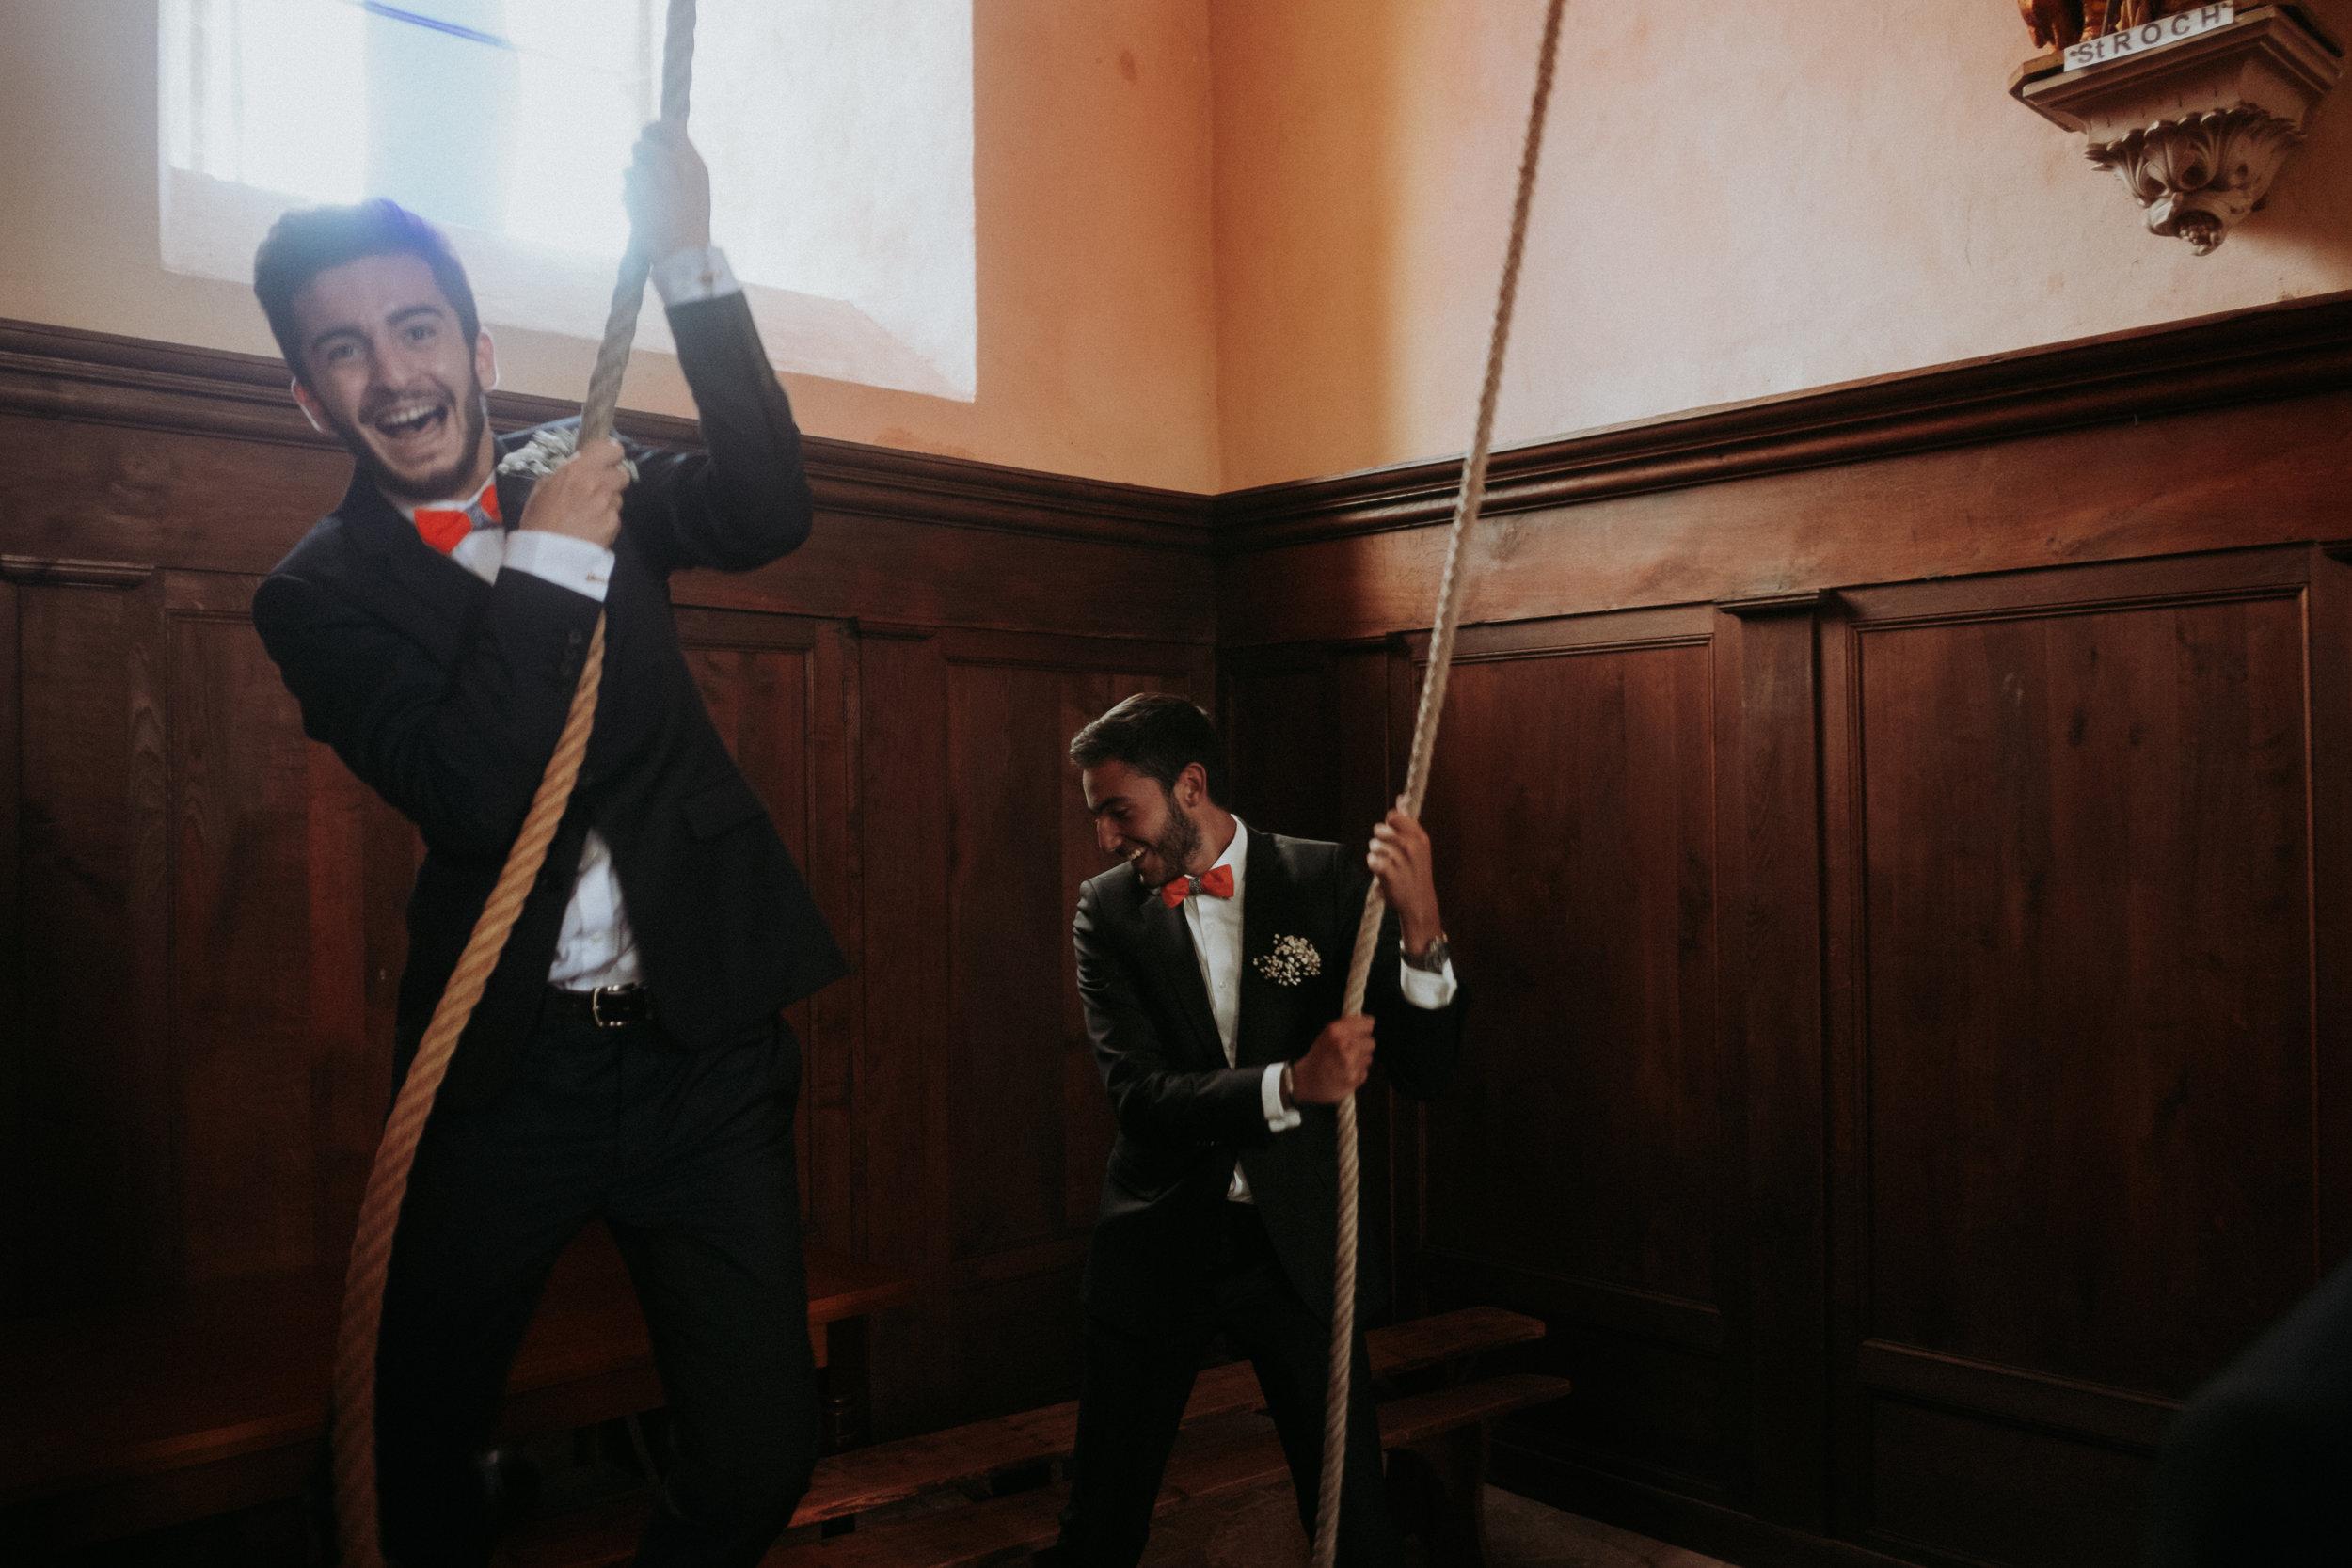 Mariage - Corcelles en Beaujolais